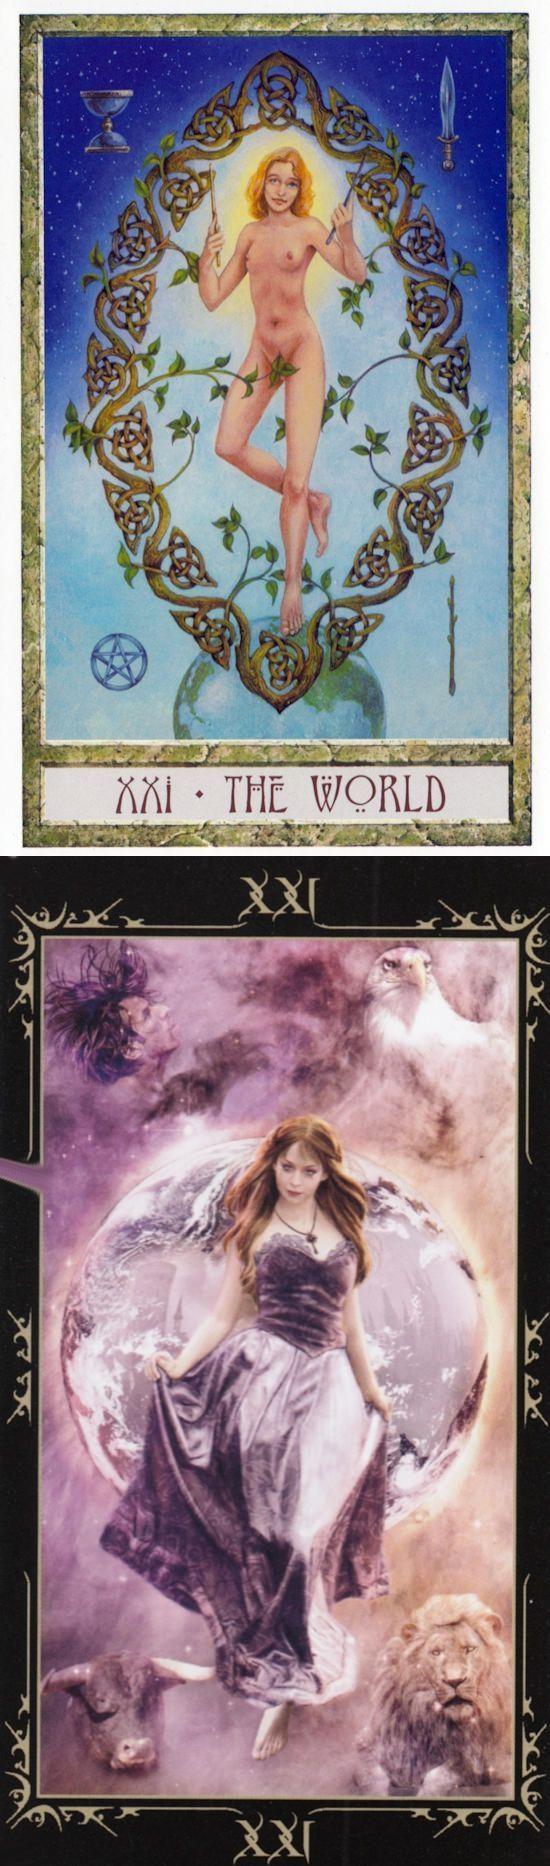 THE WORLD: completion and incompletion (reverse). Druid Craft Tarot deck and Dark Fairytale Tarot deck: tarottapestry, tarotto go vs one card tarot. New tarot cards how to read and tarot meanings major arcana. #spells #empress #iosapplication #tarotcardshowtoread